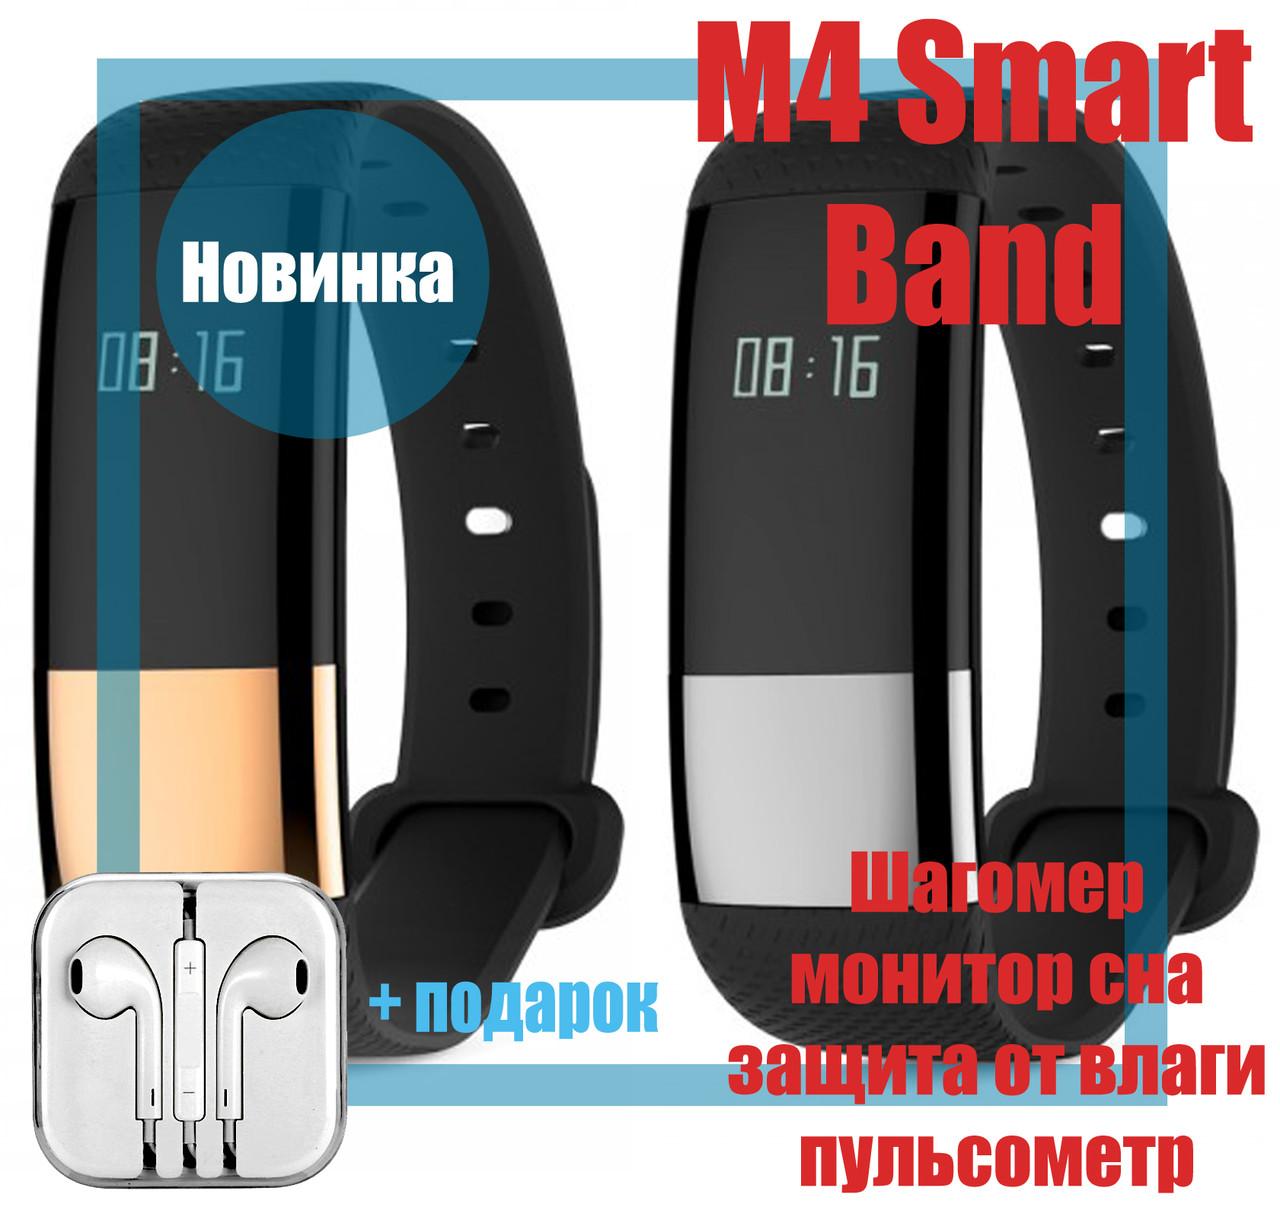 M4 Band Фитнес браслет Smart Watch Bluetooth 4.2, шагомер, фитнес трекер, пульс, монитор сна реплика